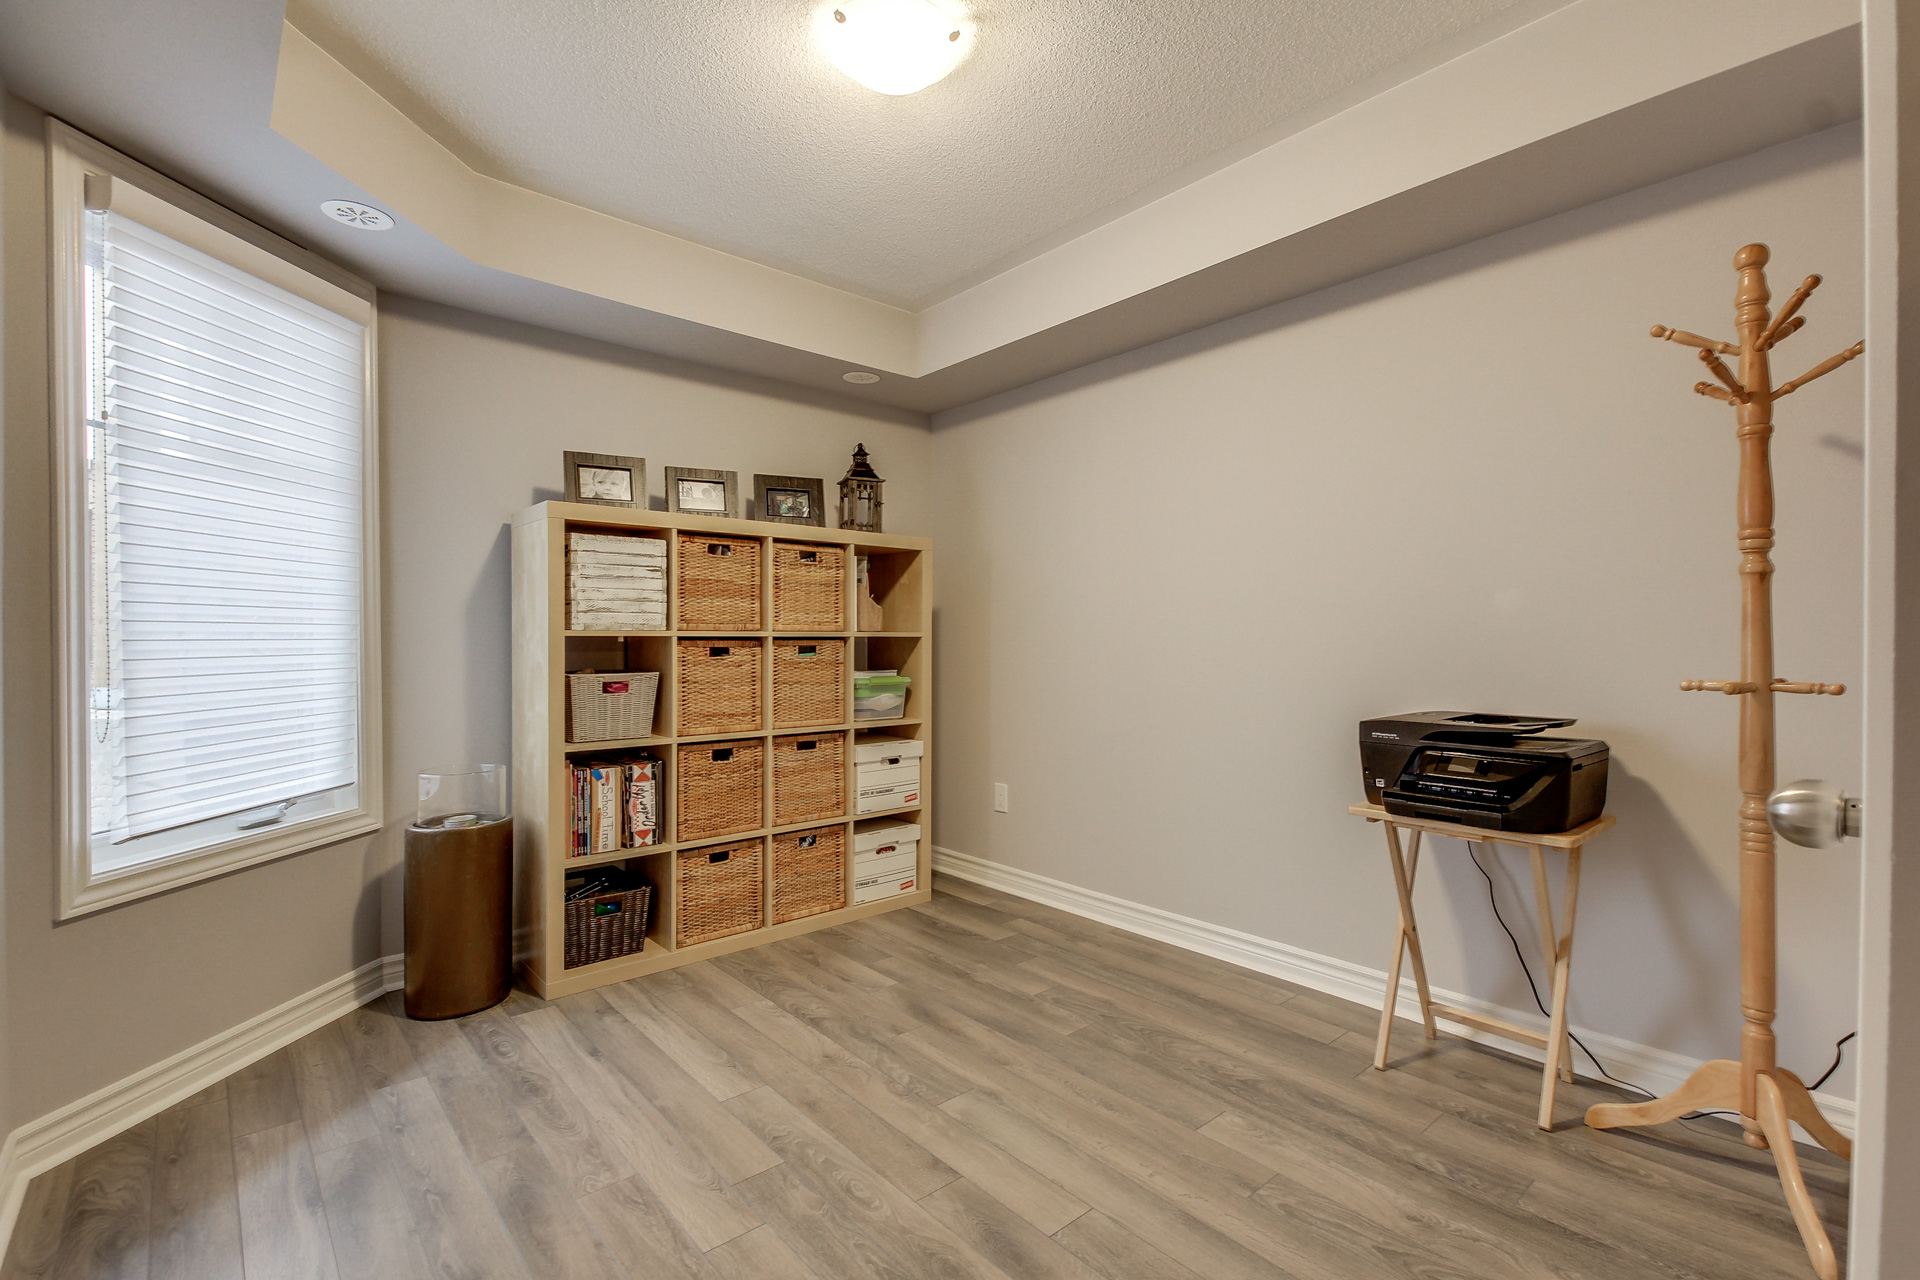 2420-Baronwood-Drive-2201-Oakville-For-Sale-Karly-Moore (22).jpg